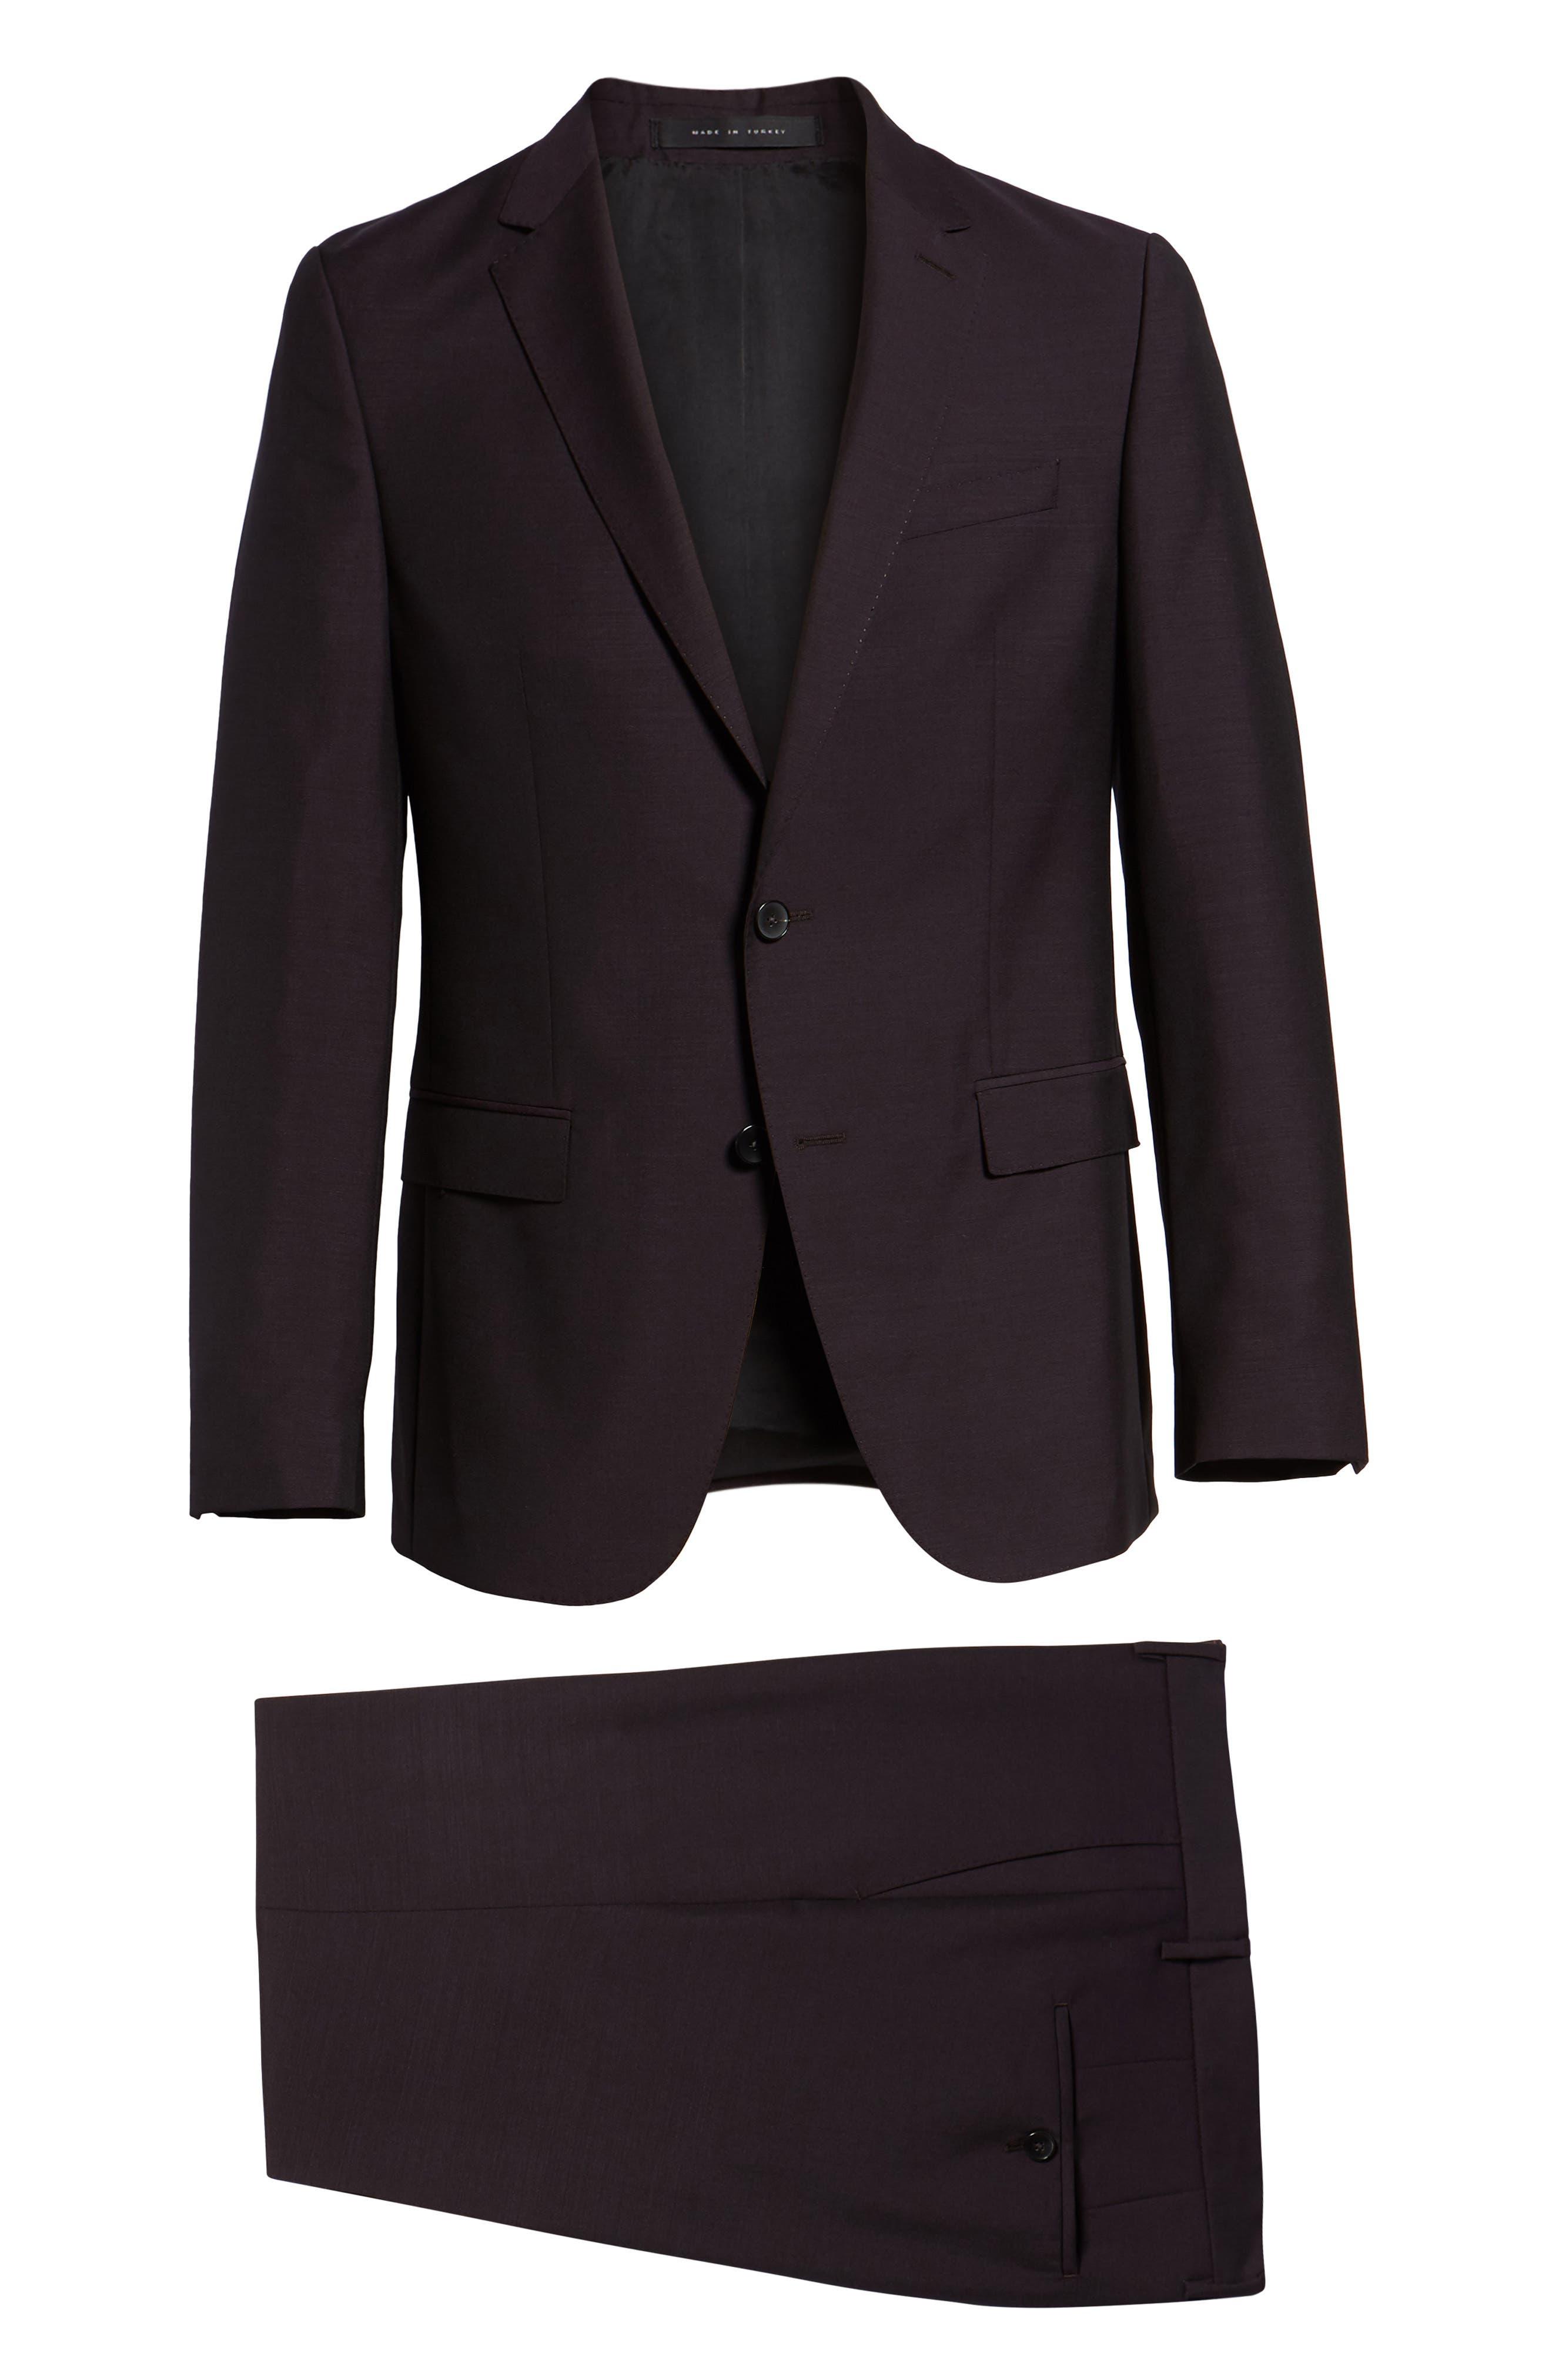 Novan/Ben Trim Fit Solid Wool & Mohair Suit,                             Alternate thumbnail 8, color,                             DARK PURPLE